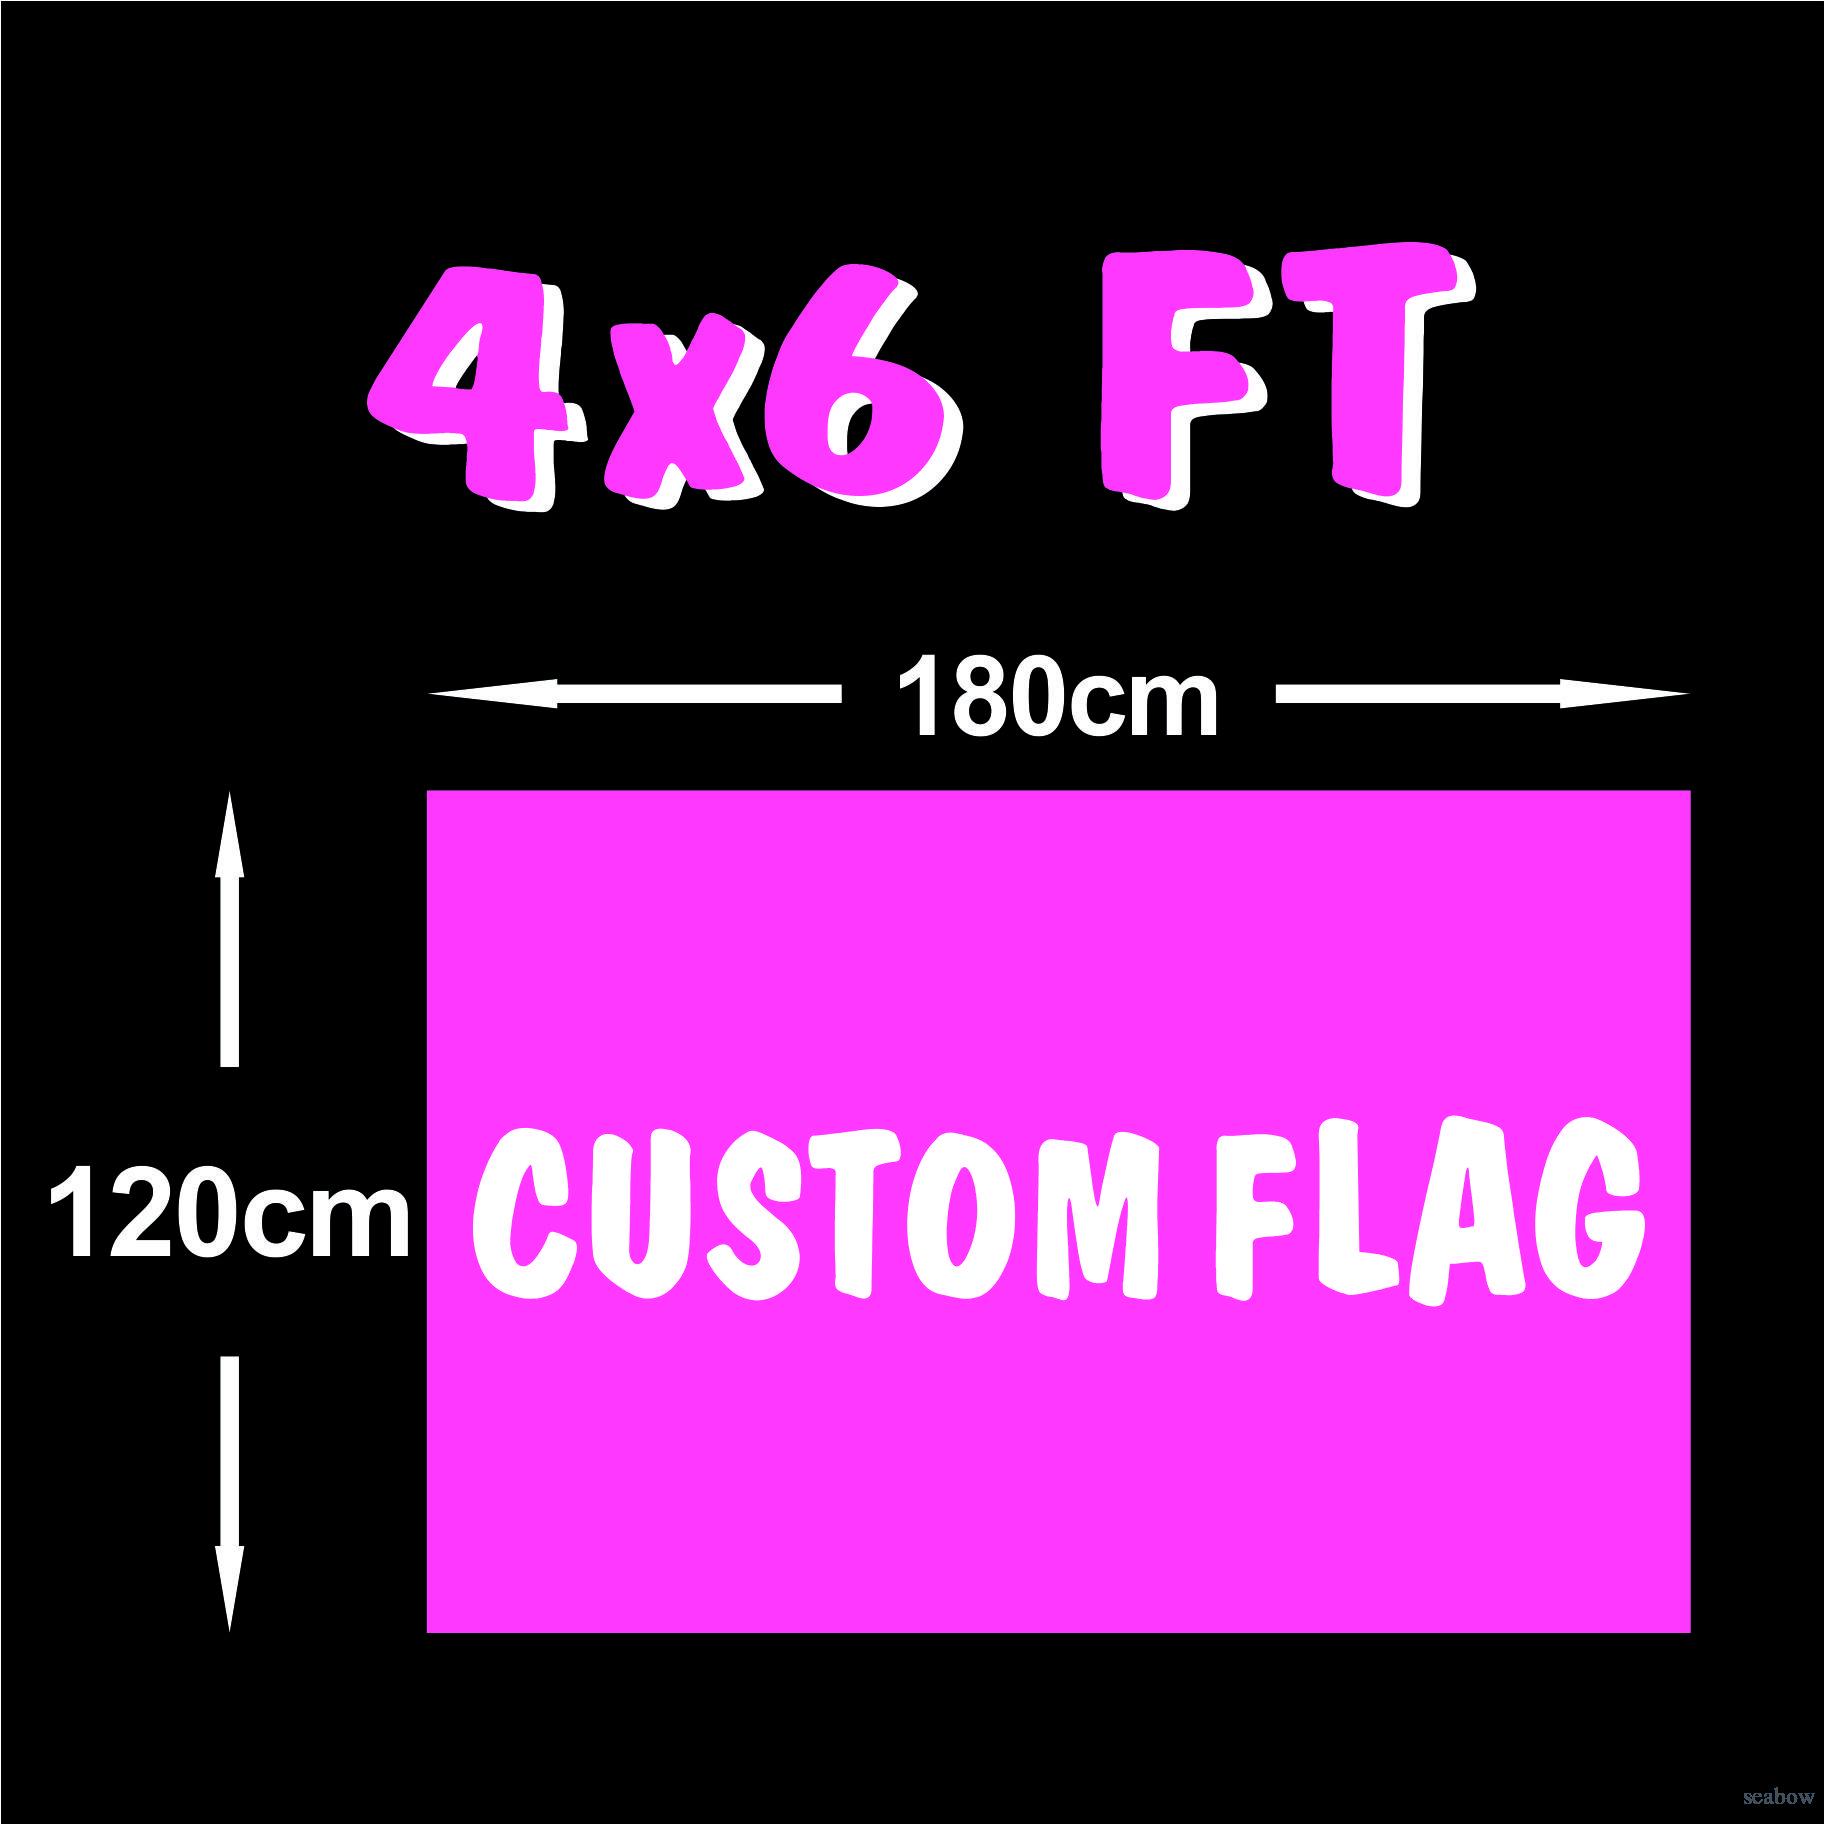 Kundenspezifische Flaggen-4x6 FT Banner 120x180cm Sports Party Club Geschenk Digital Printing Polyester Hanging Indoor Outdoor Printed Flaggen und Banner!